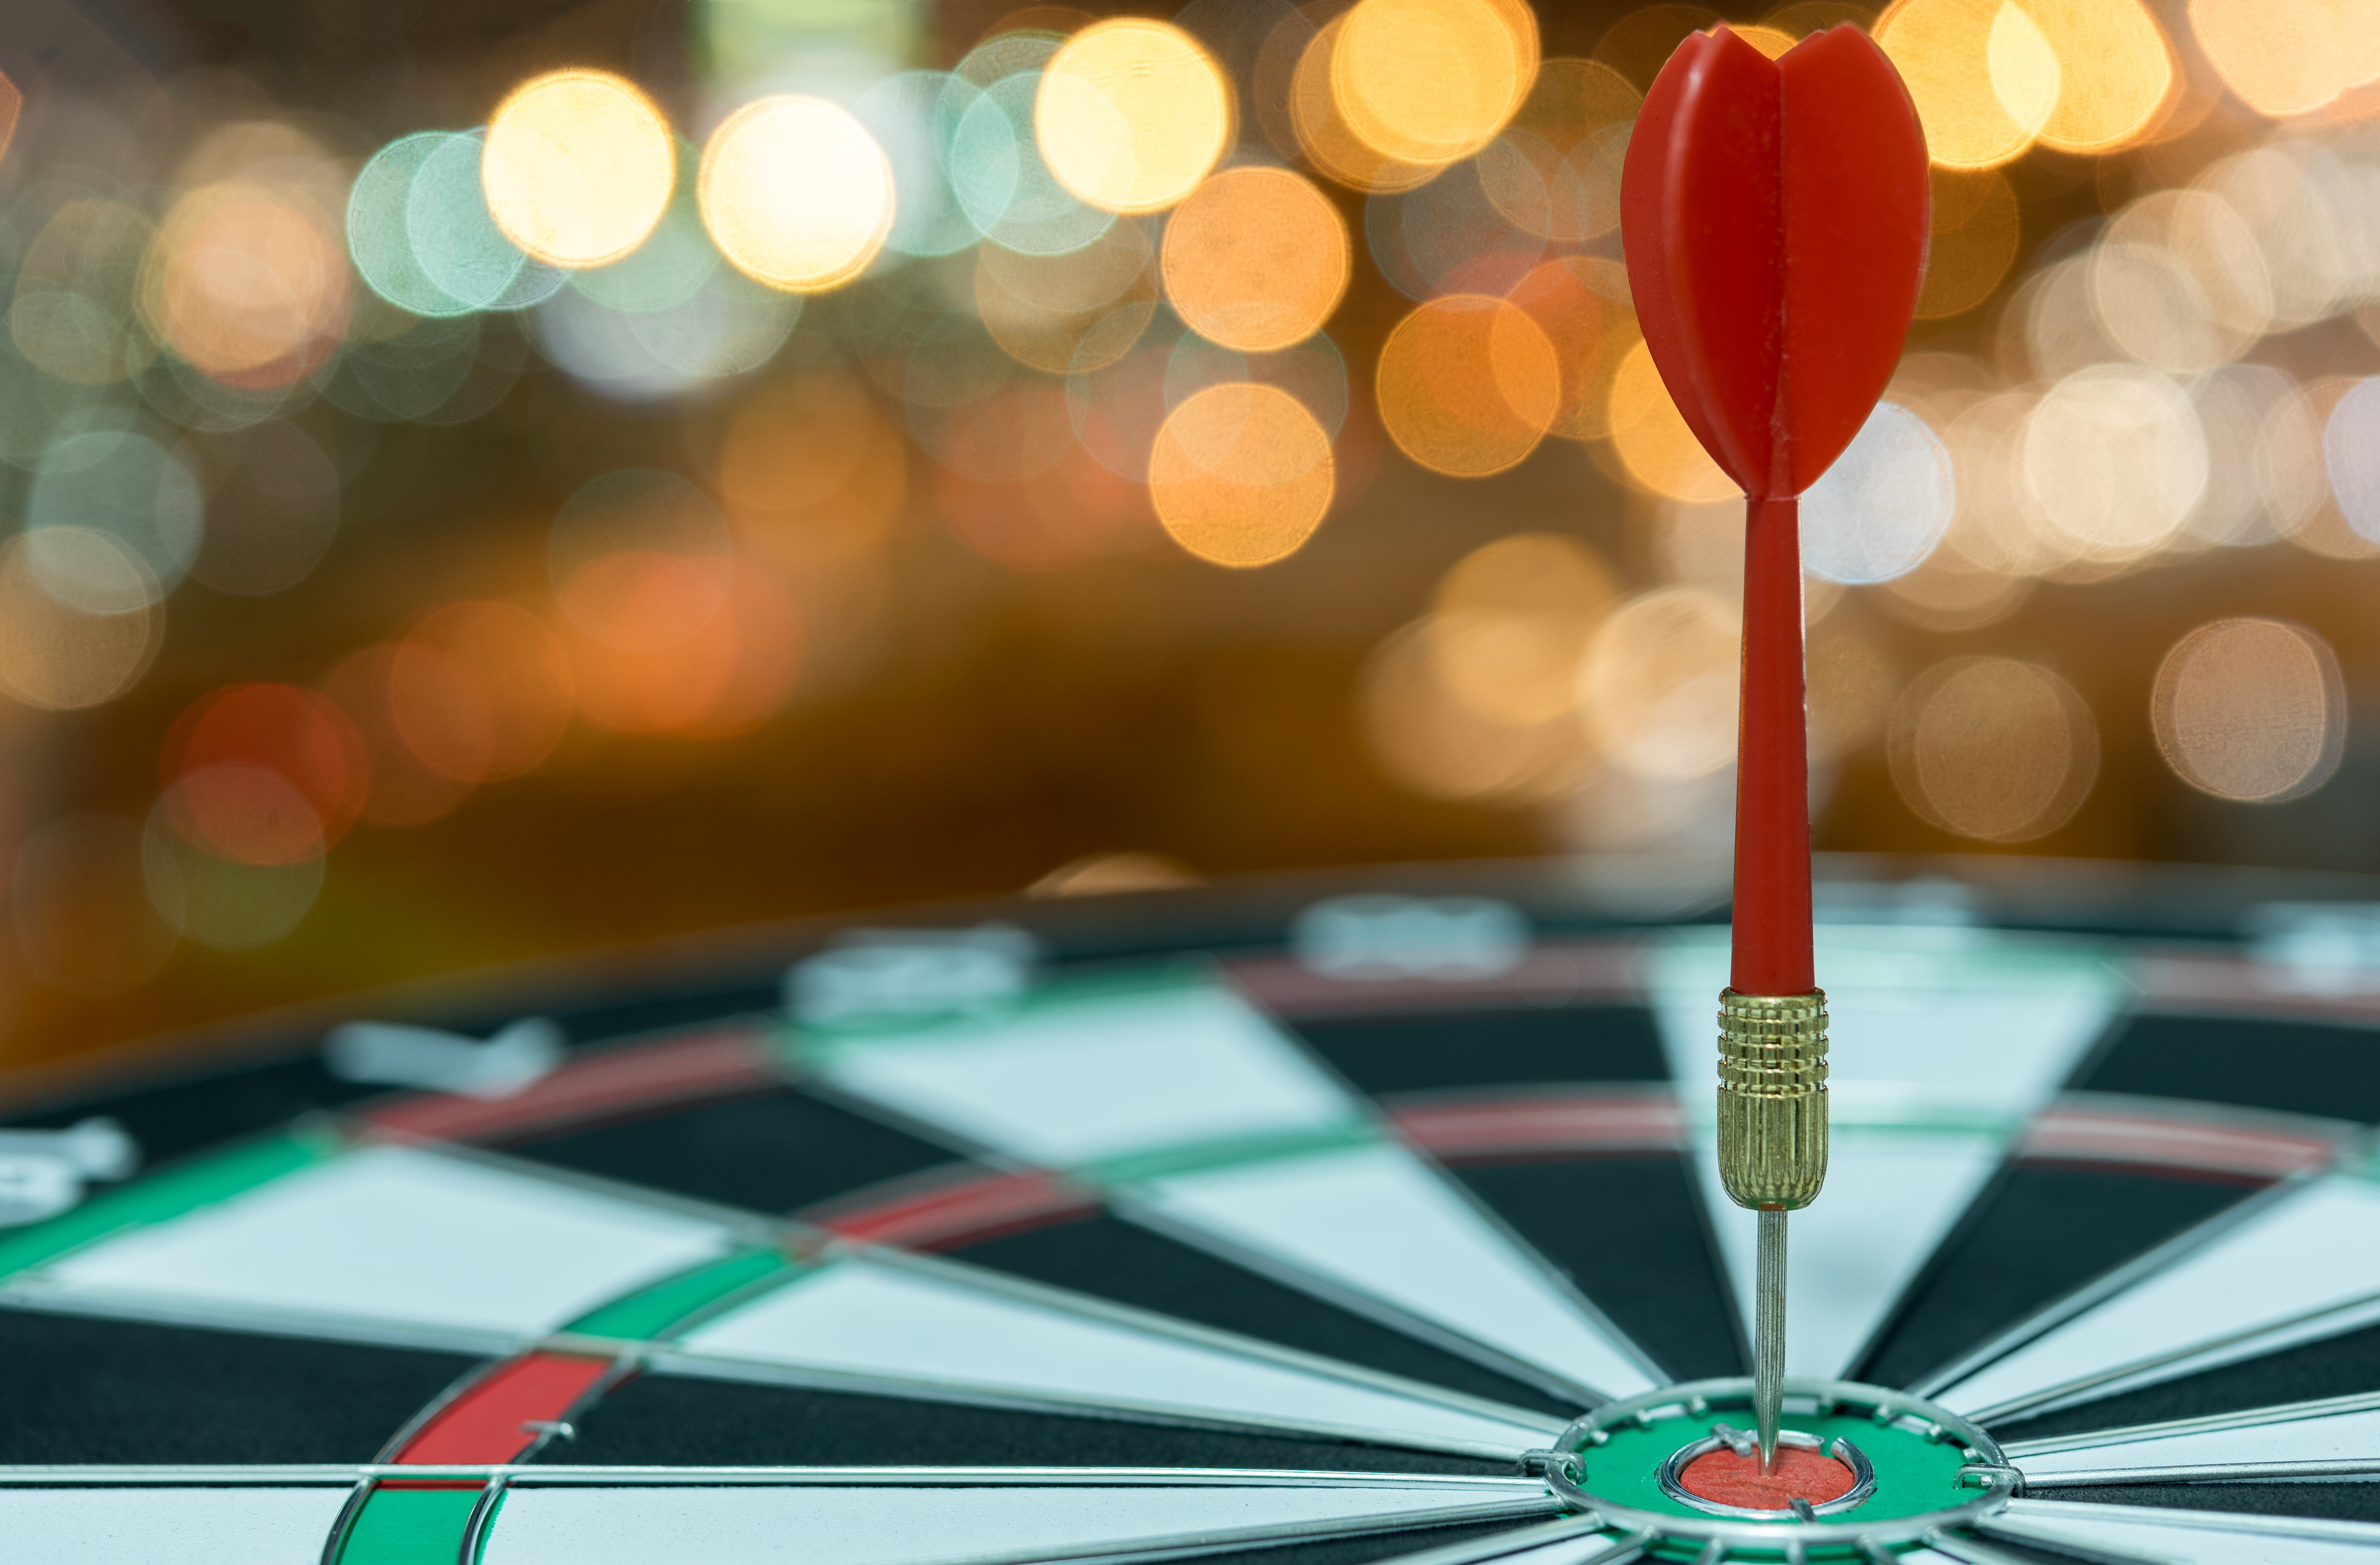 dart-target-arrow-bullseye-bokeh-background-jpg